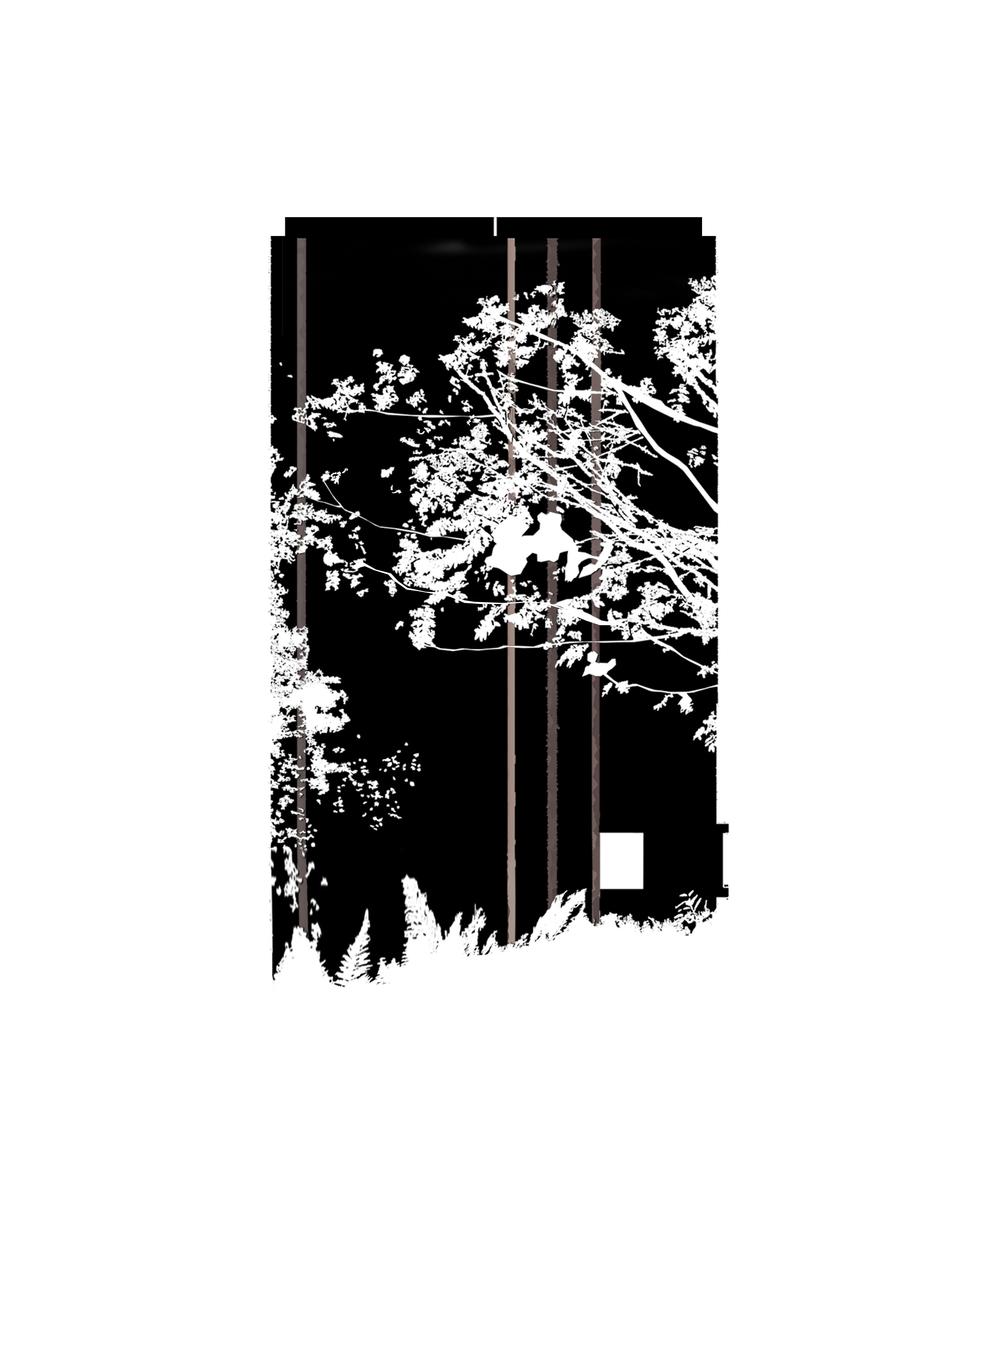 bild3 (1)SDFS copy dftg.jpg